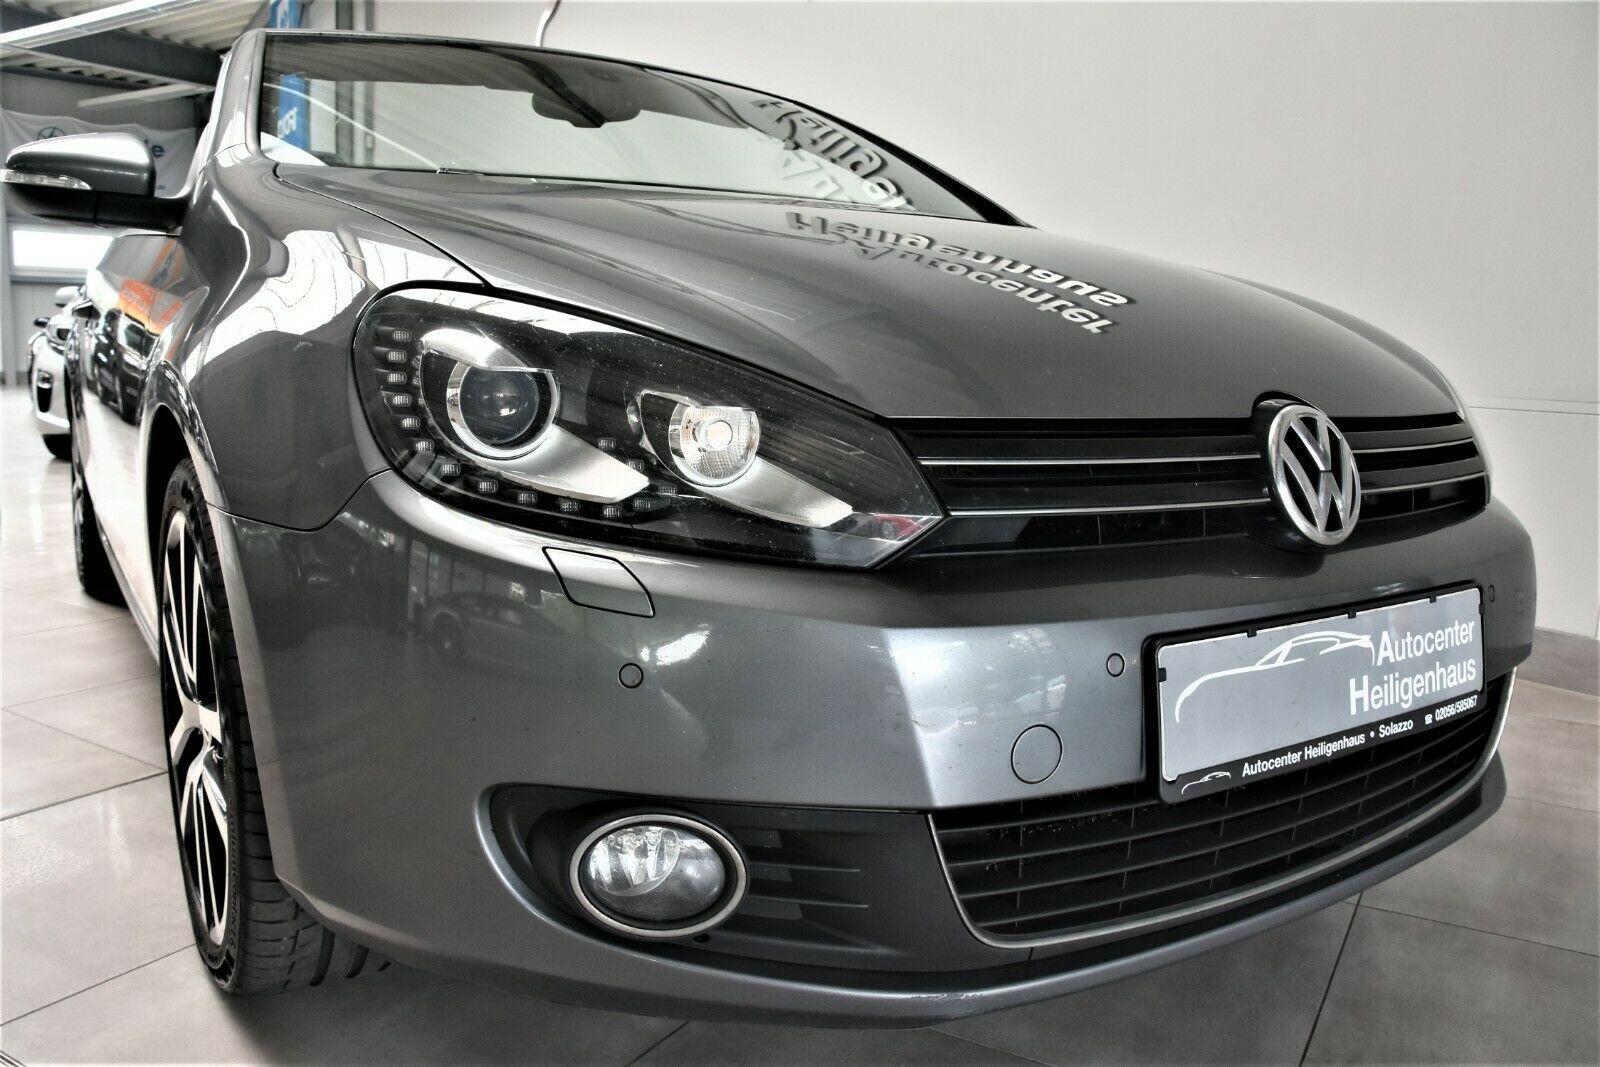 VW Golf VI 1.6 TDI Cabrio Klima Leder Bi-Xenon PDC